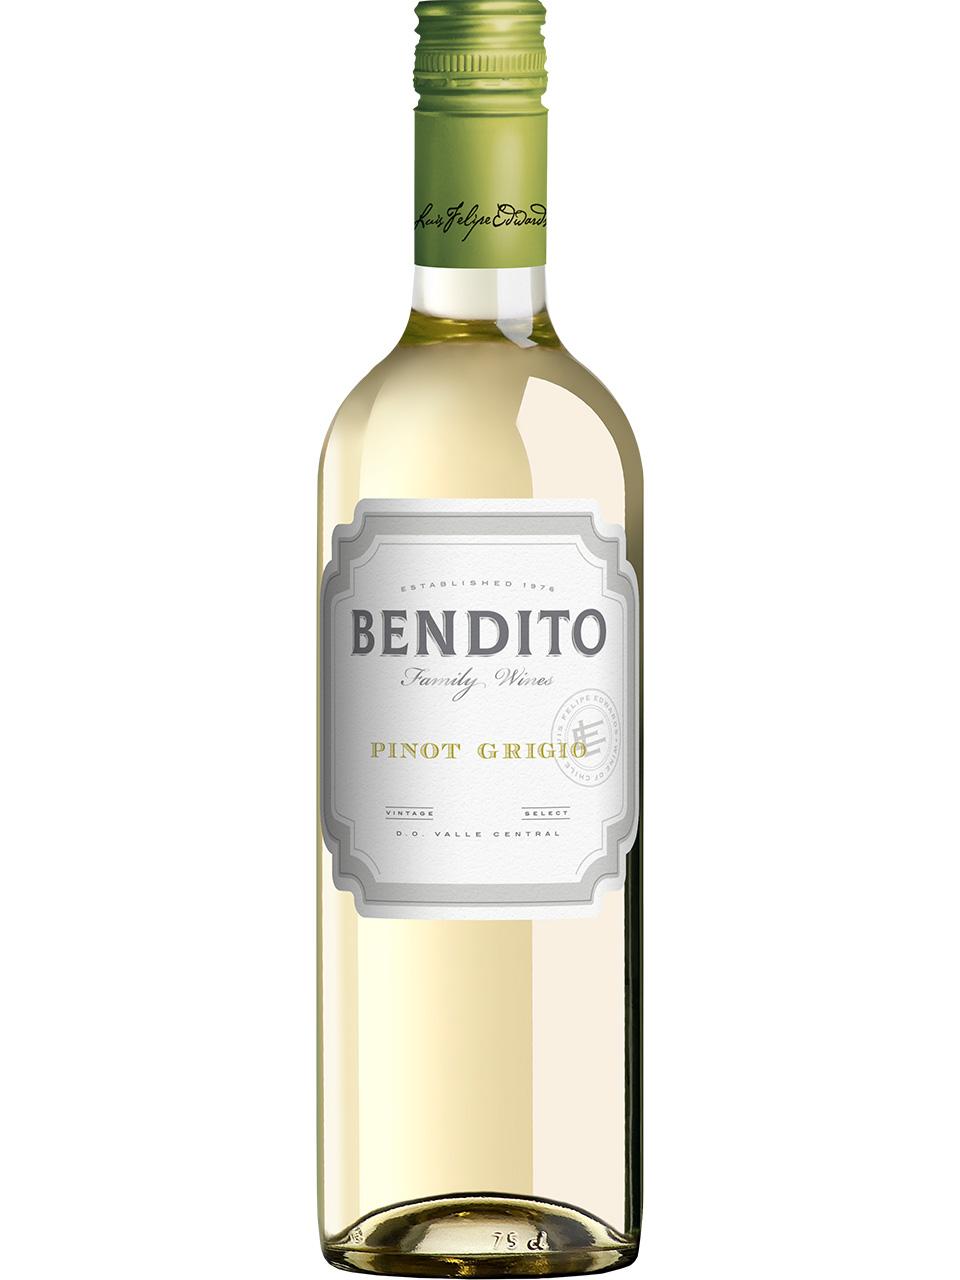 Bendito Classic Pinot Grigio